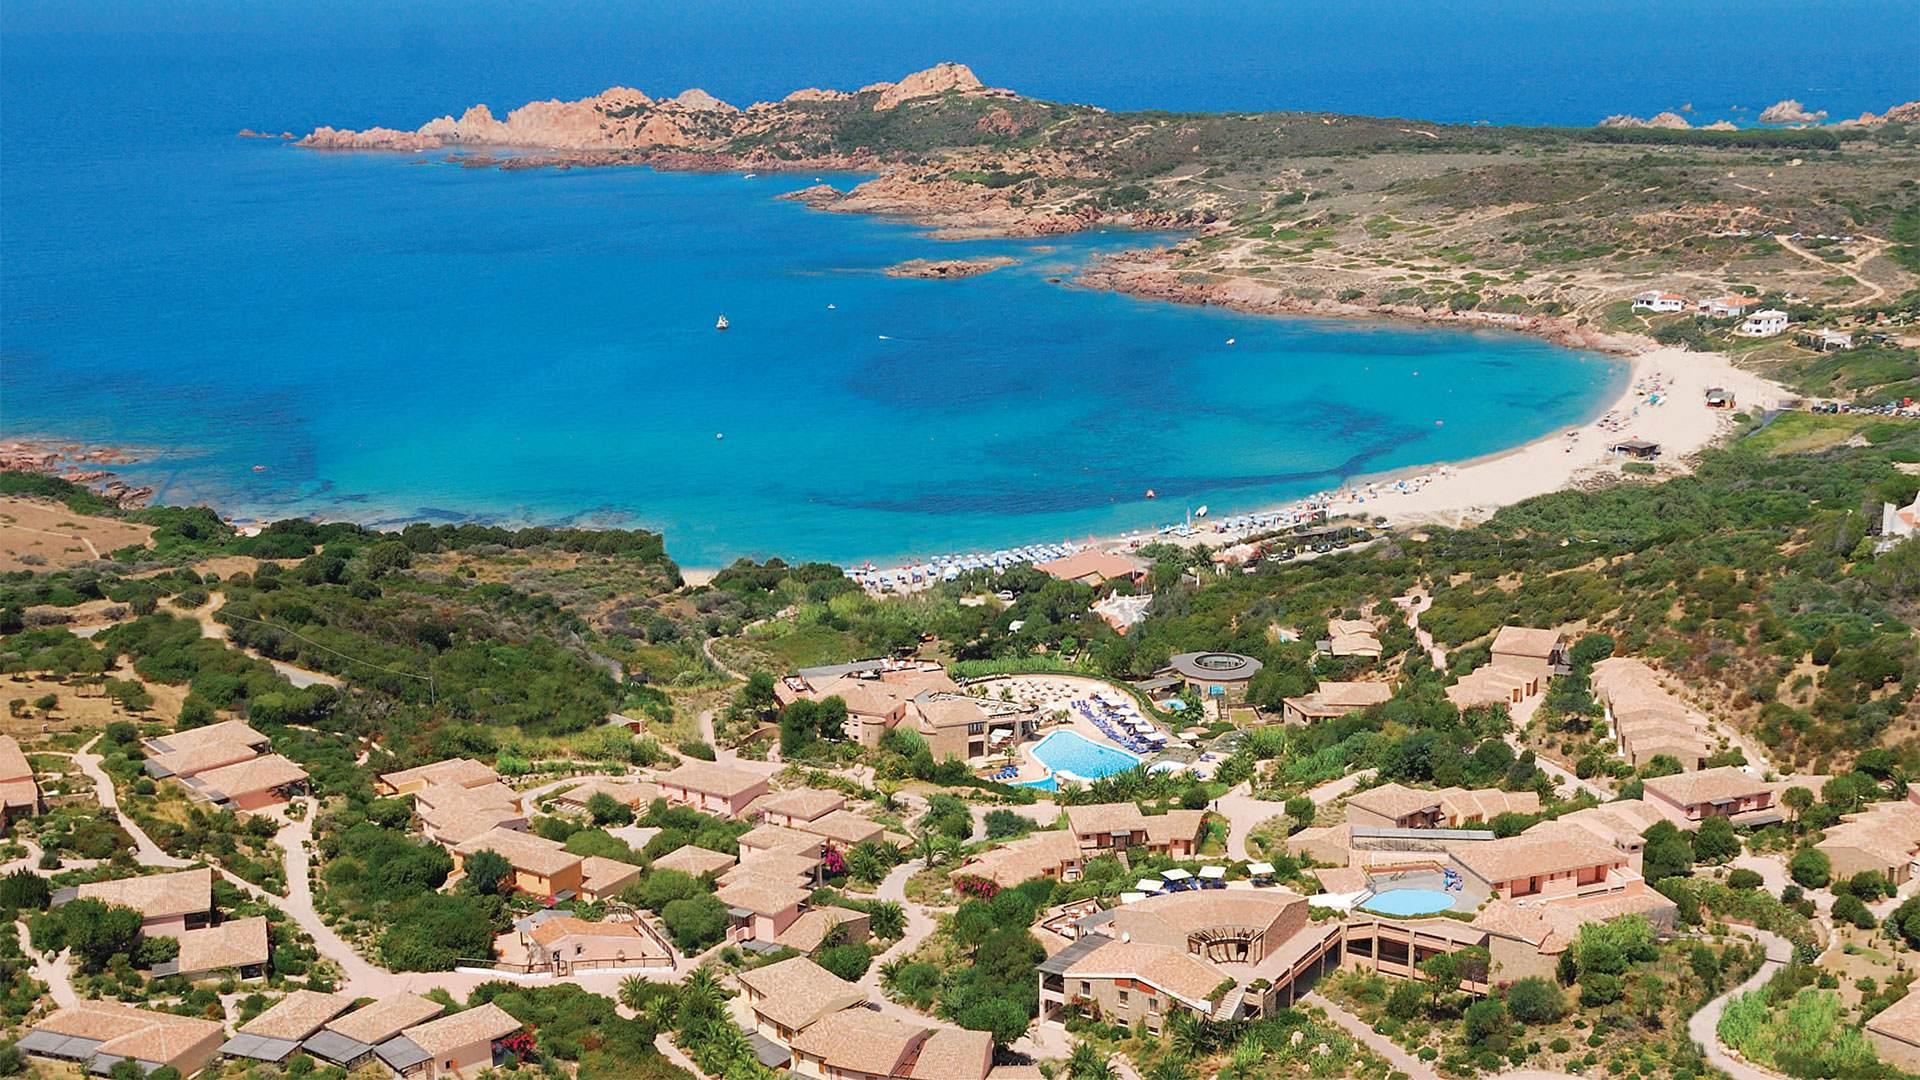 hotel-marinedda-slider-isola-rossa-spiaggia-sardegna-mare-mini